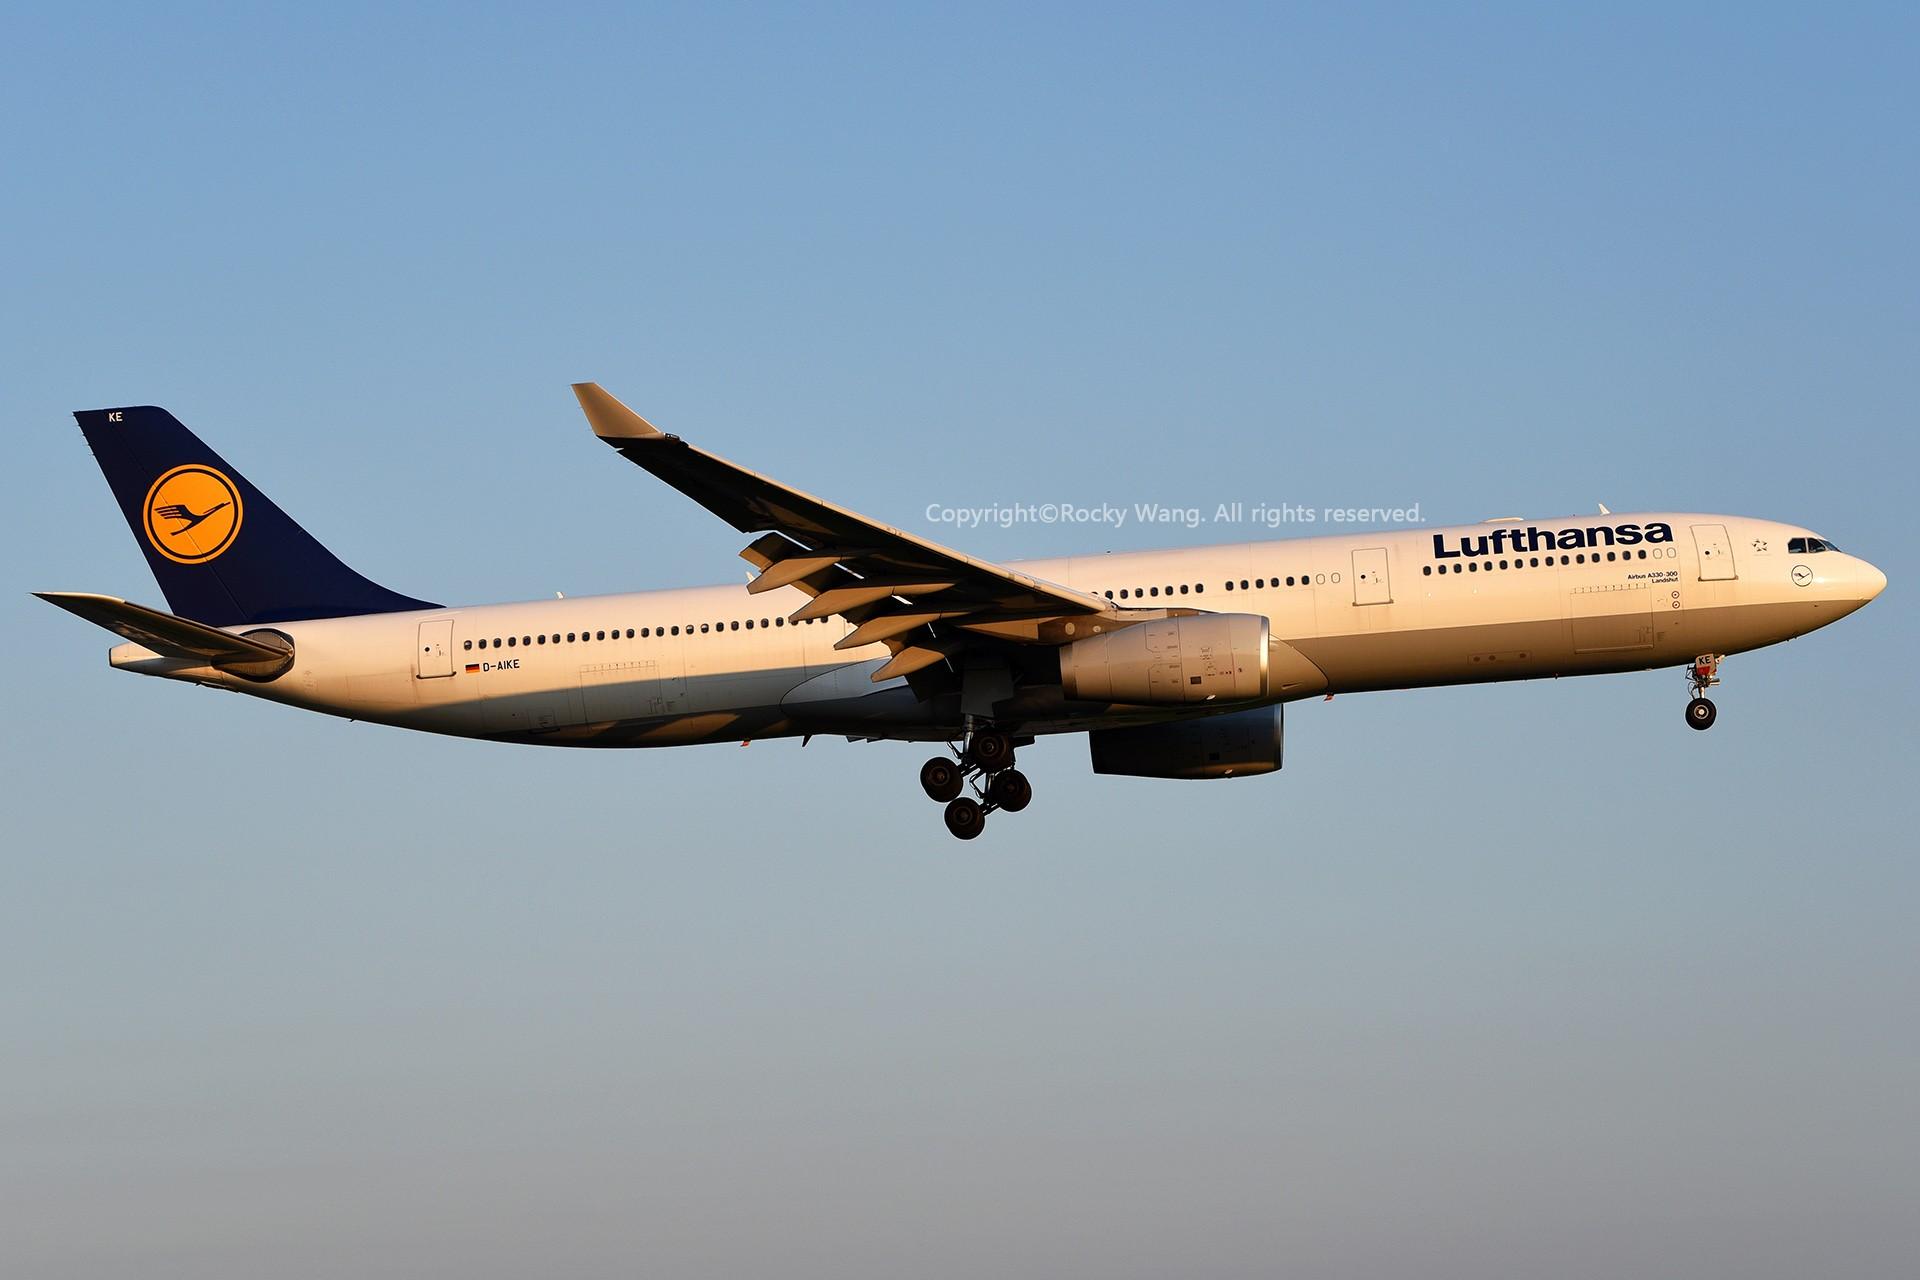 Re:[原创]A330s Around the World AIRBUS A330-343 D-AIKE 加拿大蒙特利尔特鲁多机场